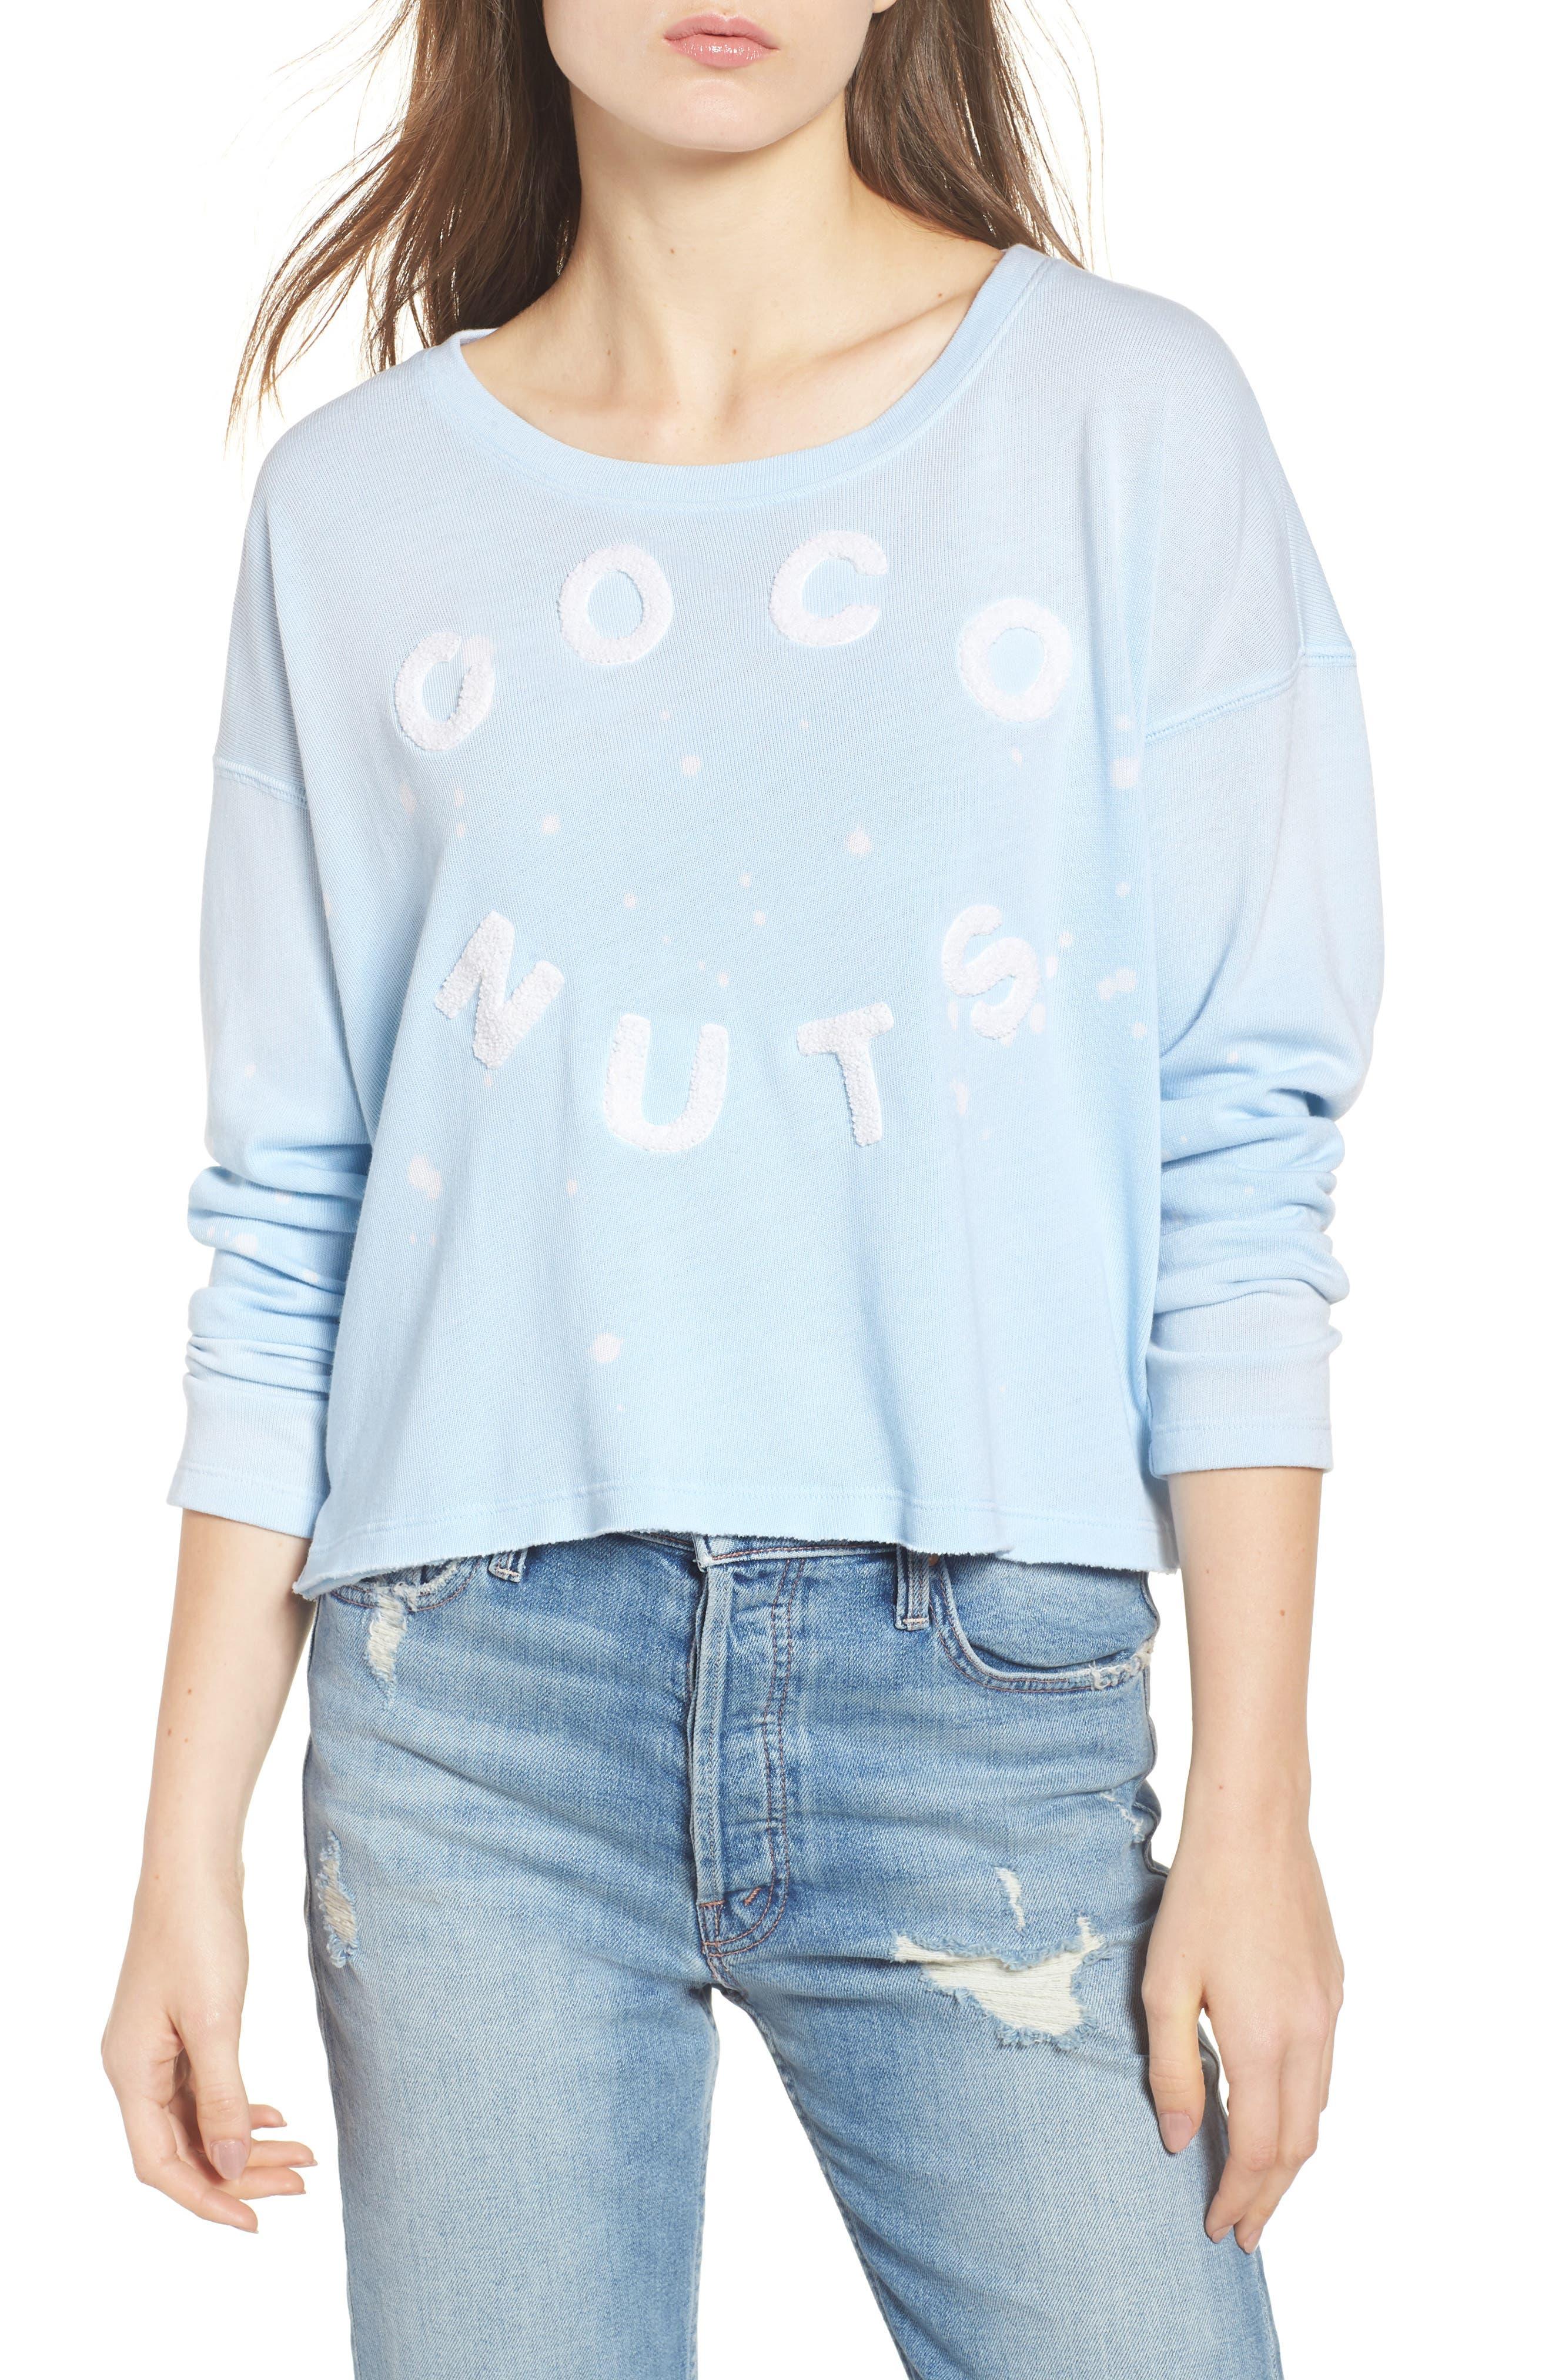 Coco Nuts Light Fleece Sweatshirt,                         Main,                         color, SUN FADED SKY